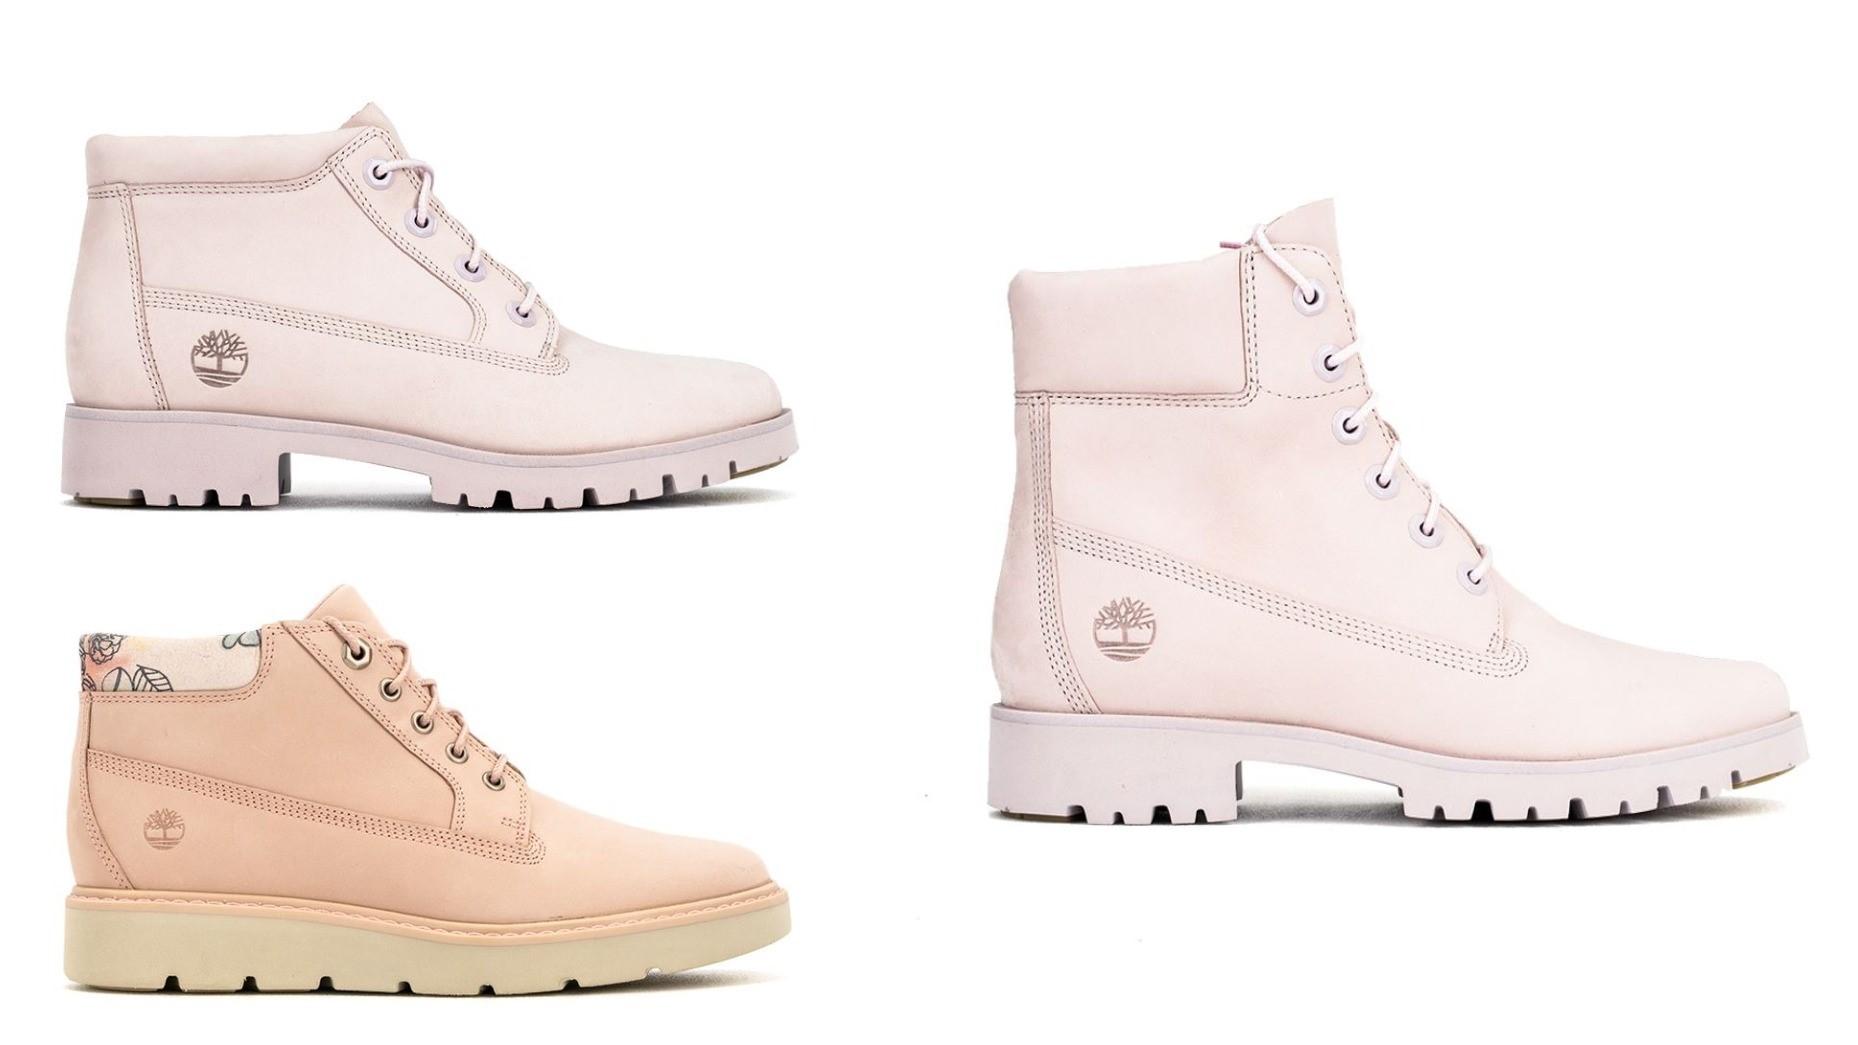 Timberland換上絕美春色~春天靴款讓你甜美依然很有型